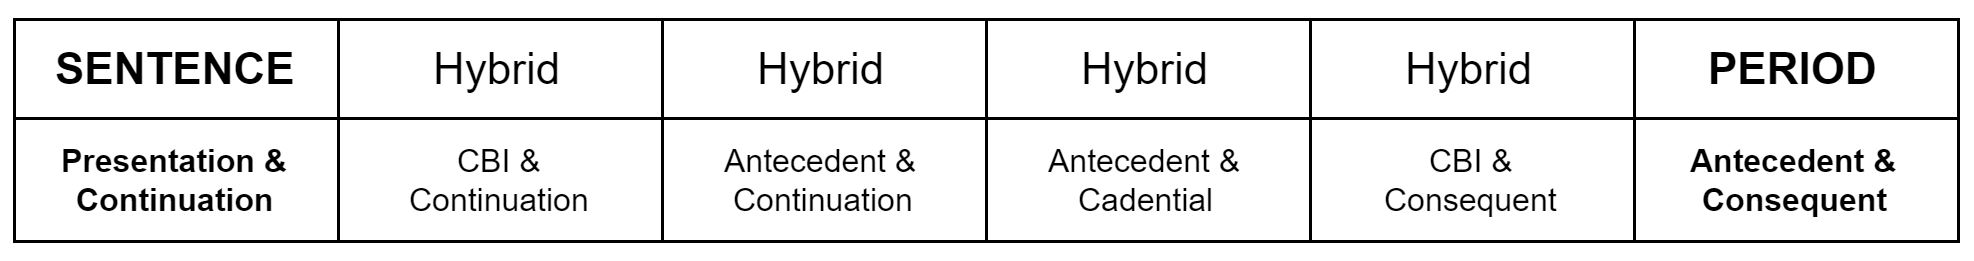 255d68 afaade1fe2594714a54bc78ea8716a5b~mv2 Piano Sonatas   Analysis: Hybrid Themes